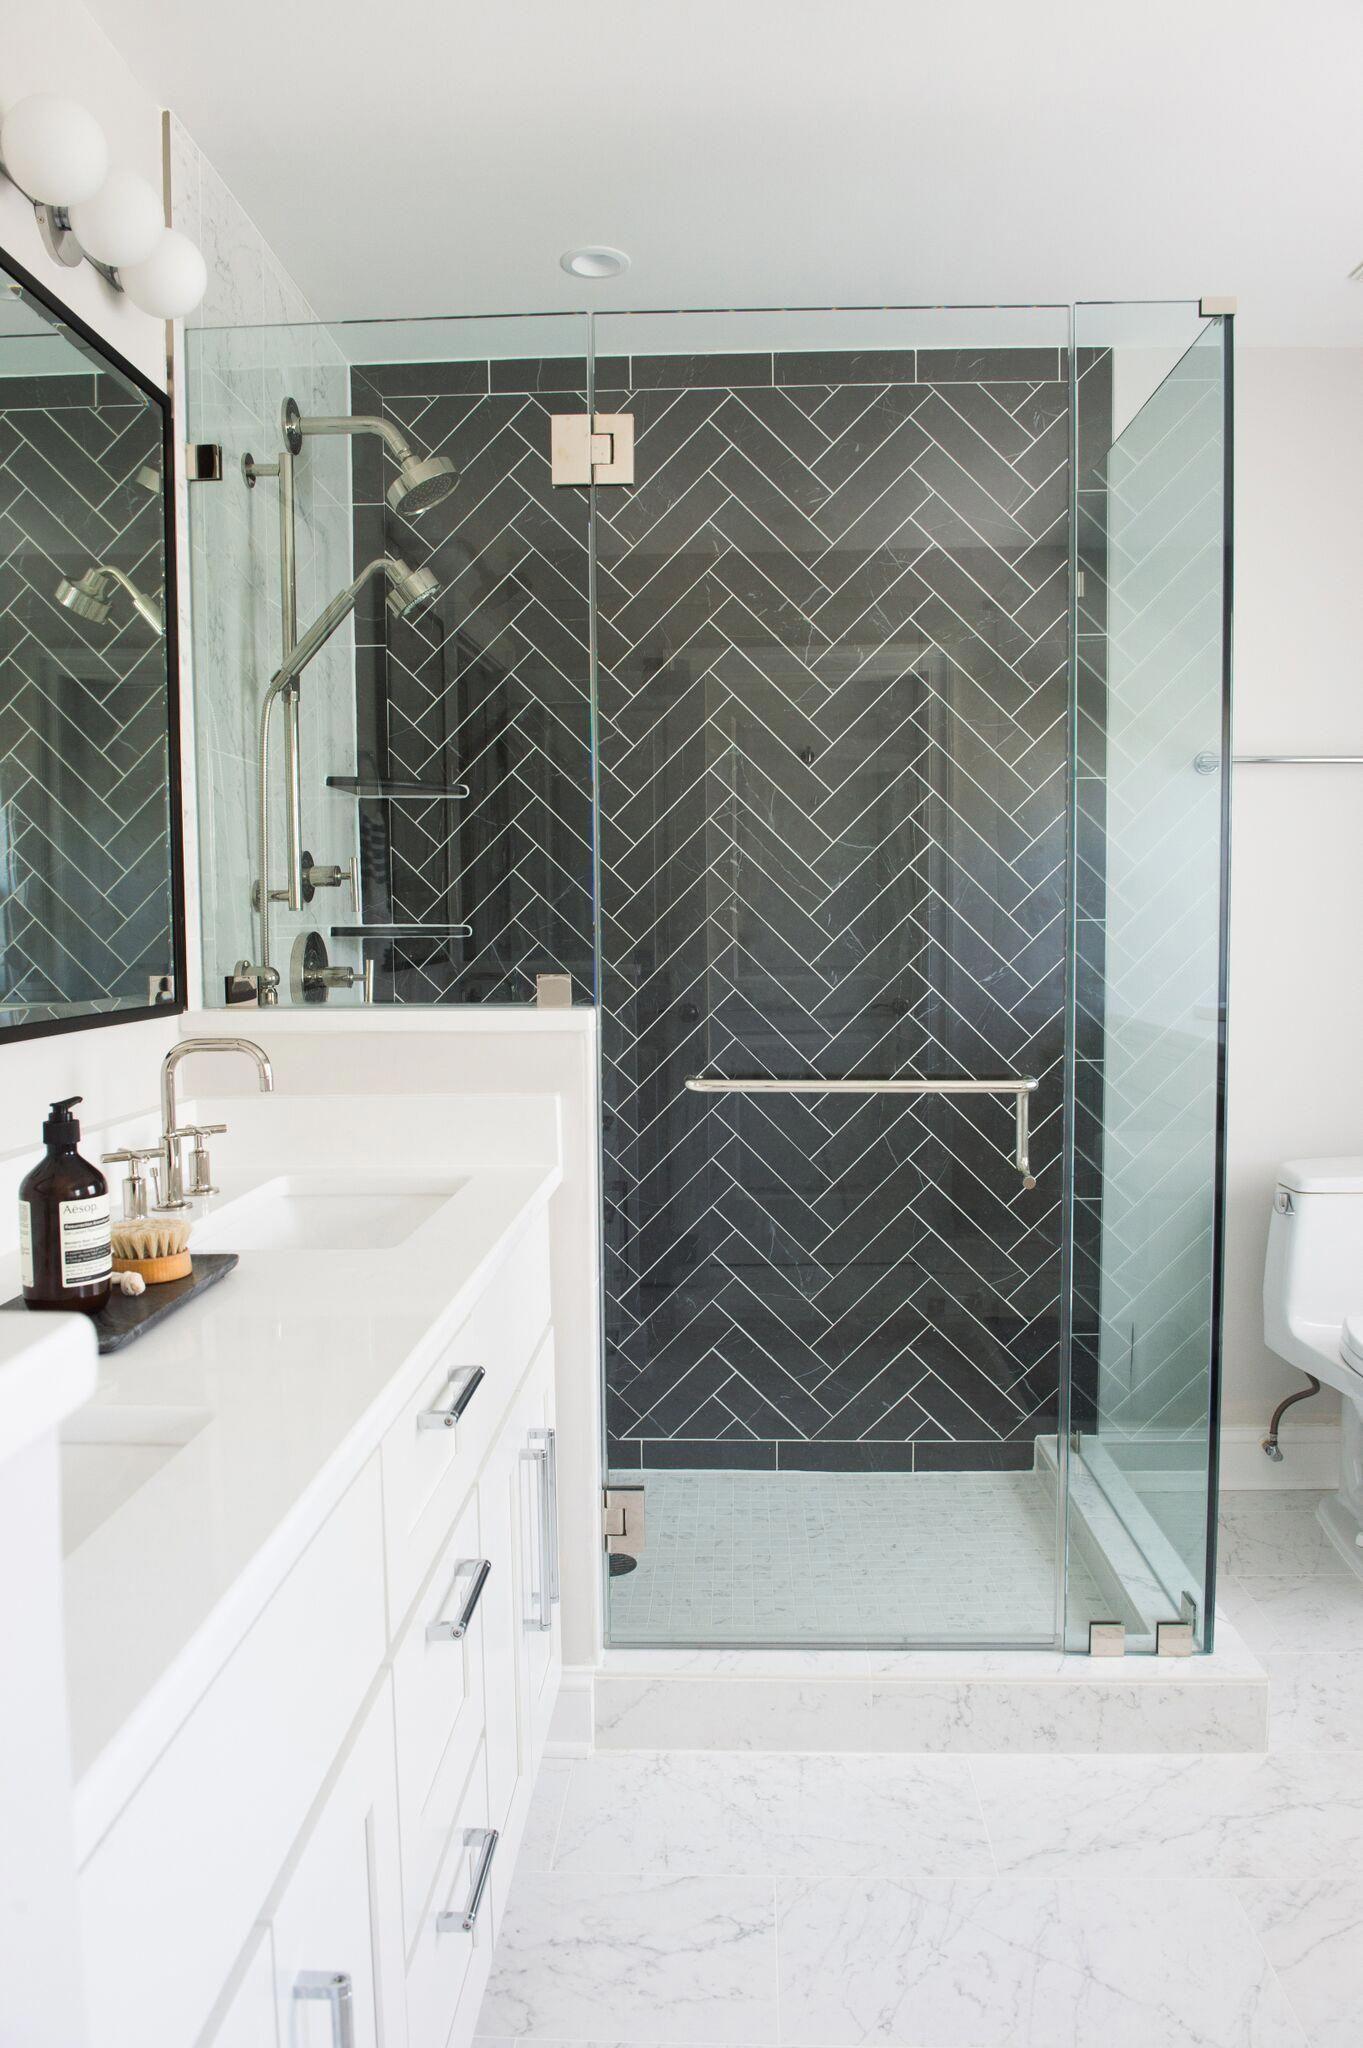 Black Herringbone Tile Bathroom Black And White Bathroom Whitetiledbathroom Herringbone Tile Bathroom Black Tile Bathrooms Tile Bathroom